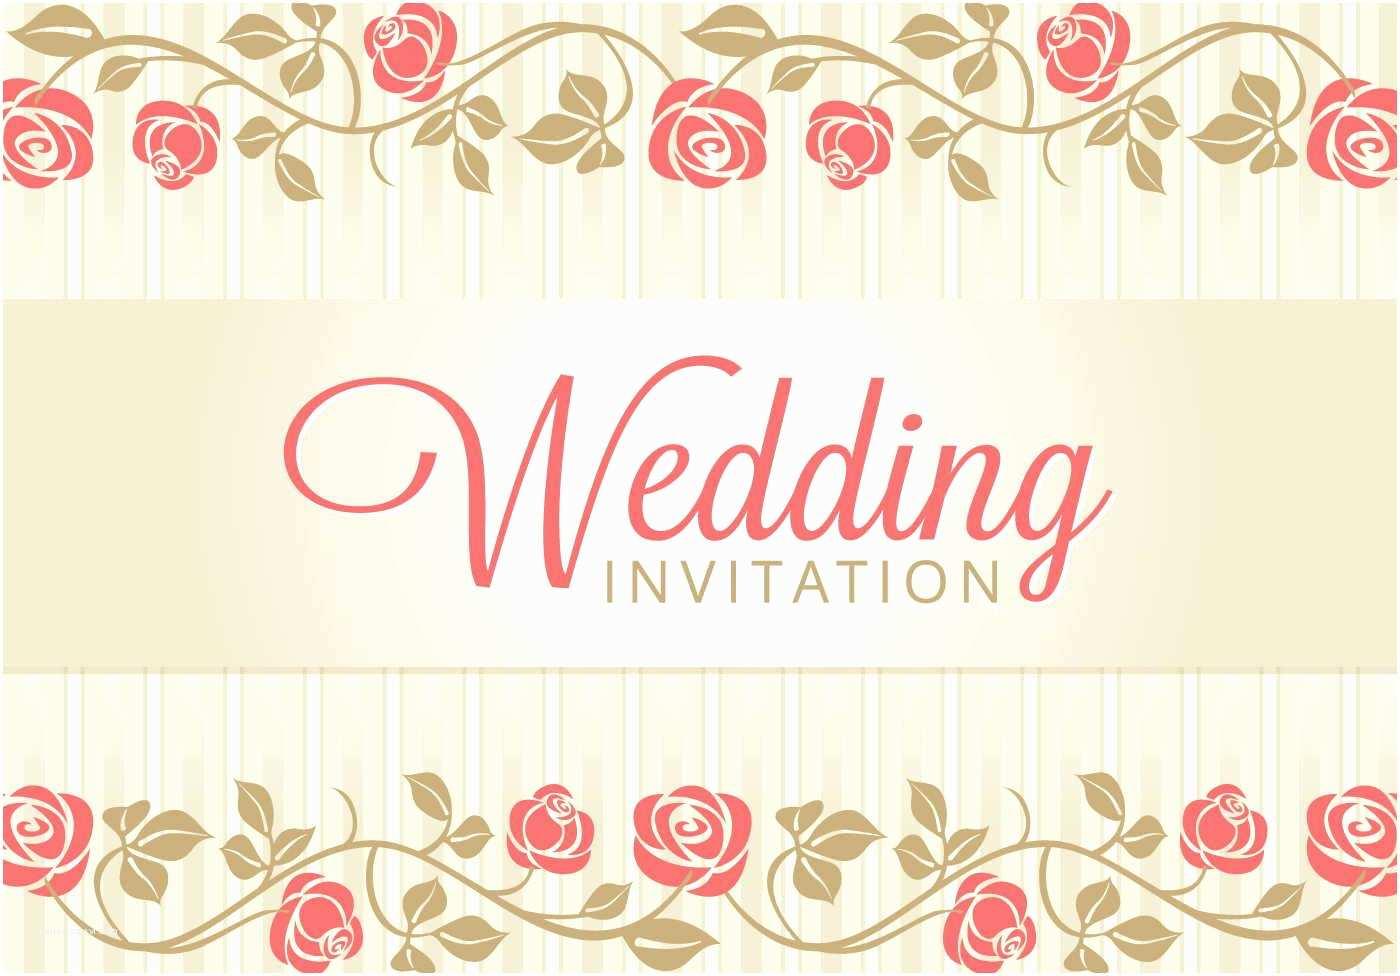 Wedding Invitation Pictures Background Vintage Wedding